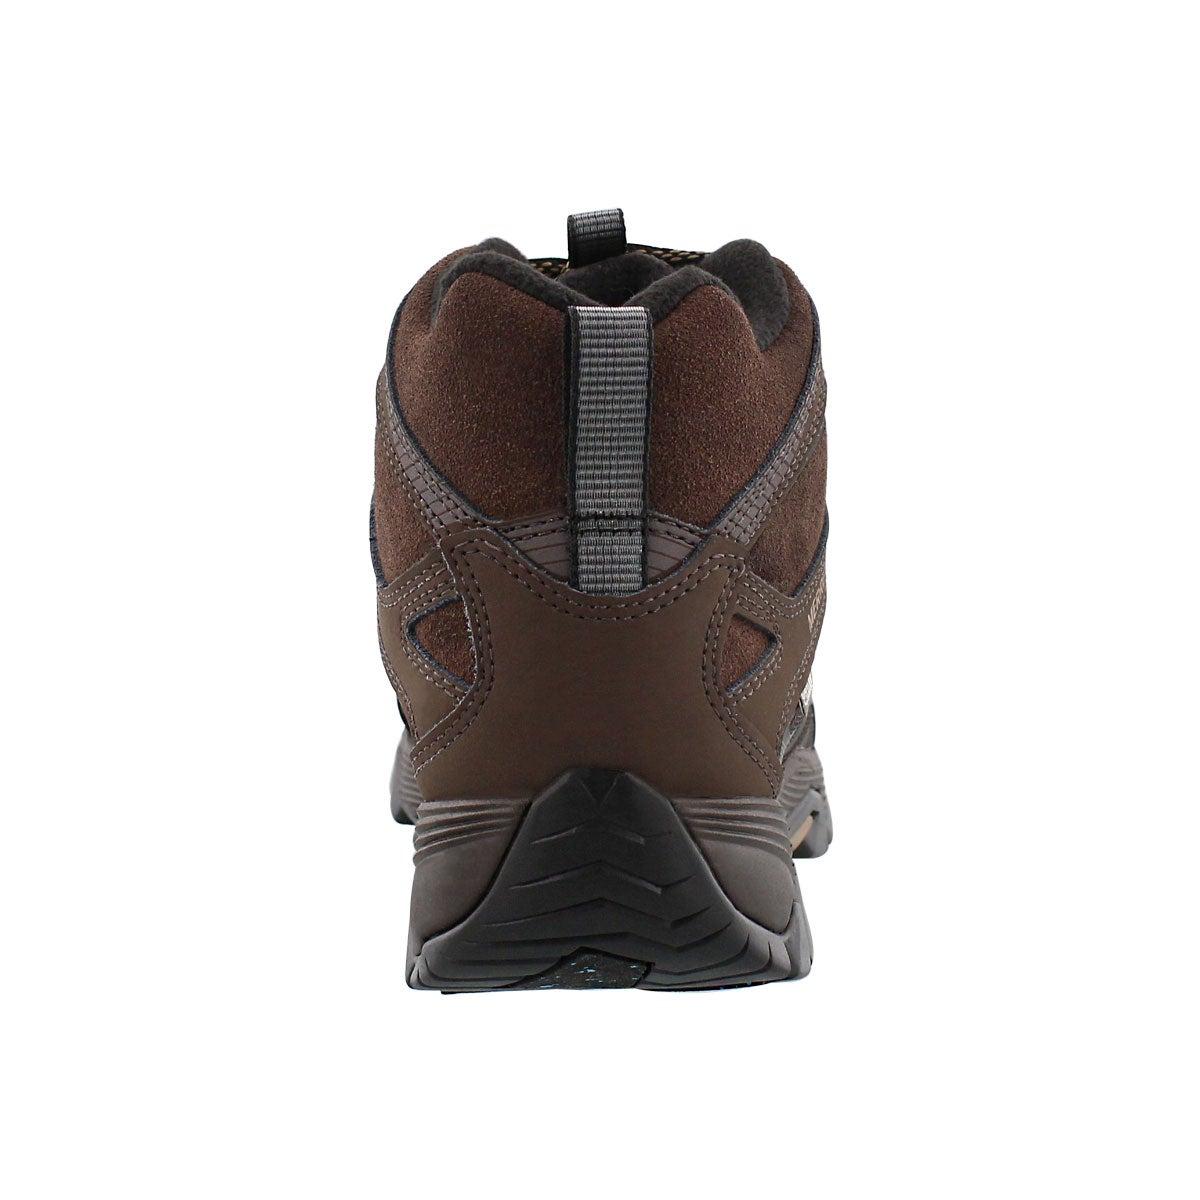 Mns Moab Fst Ice espresso hiking shoe